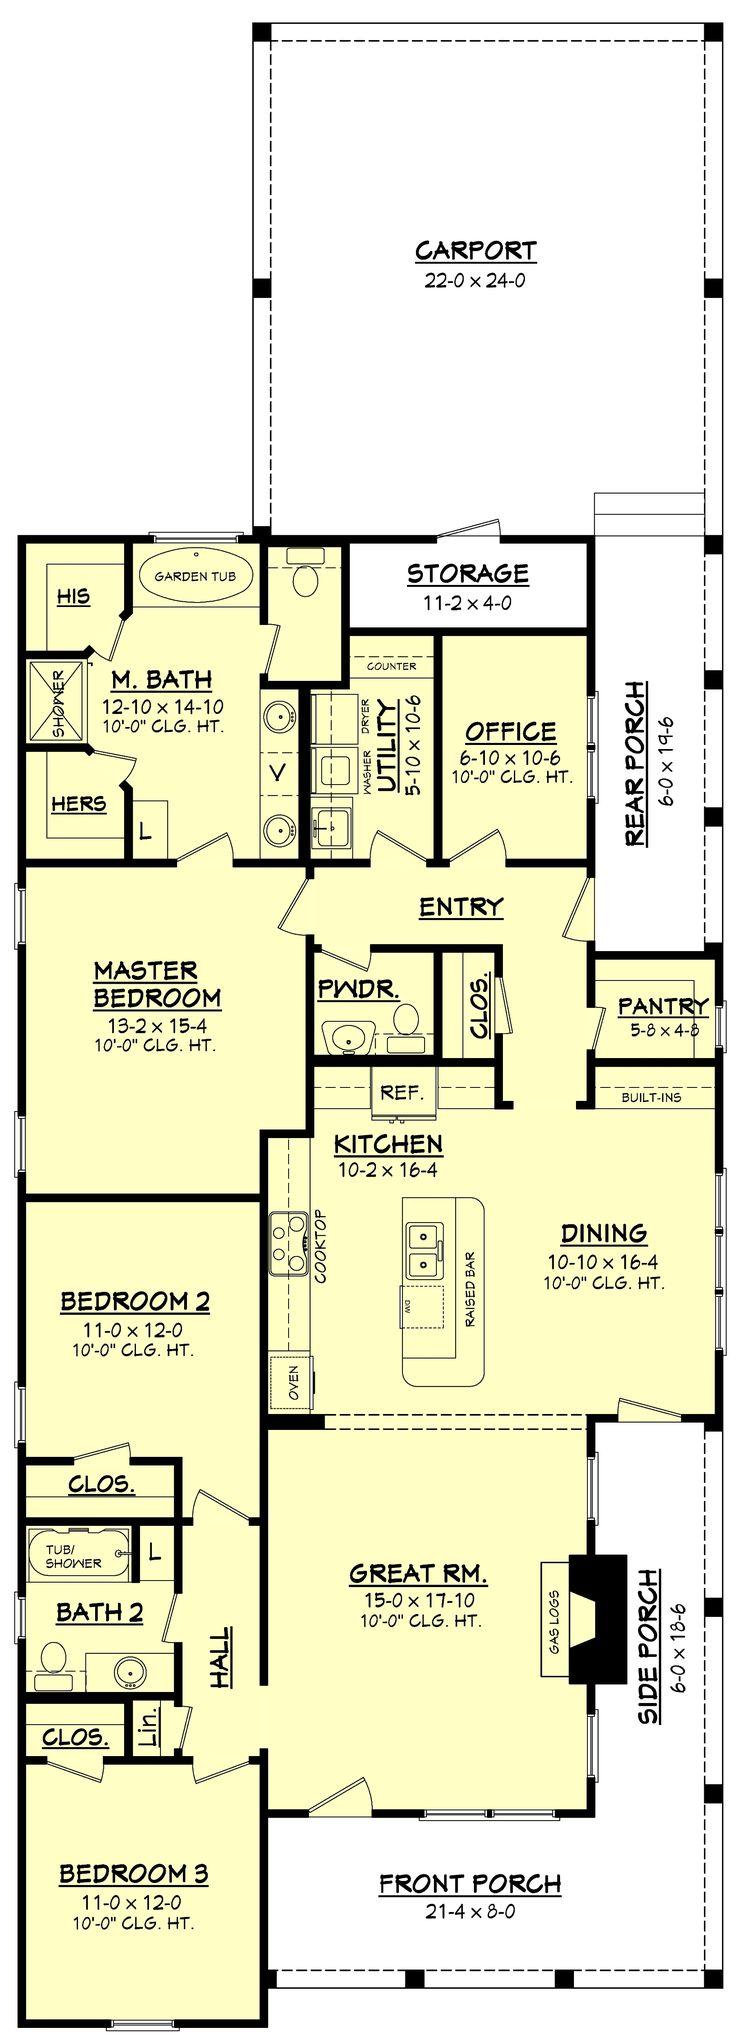 Farmhouse Style House Plan - 3 Beds 2.5 Baths 1825 Sq/Ft Plan #430-86 Main Floor Plan - Houseplans.com